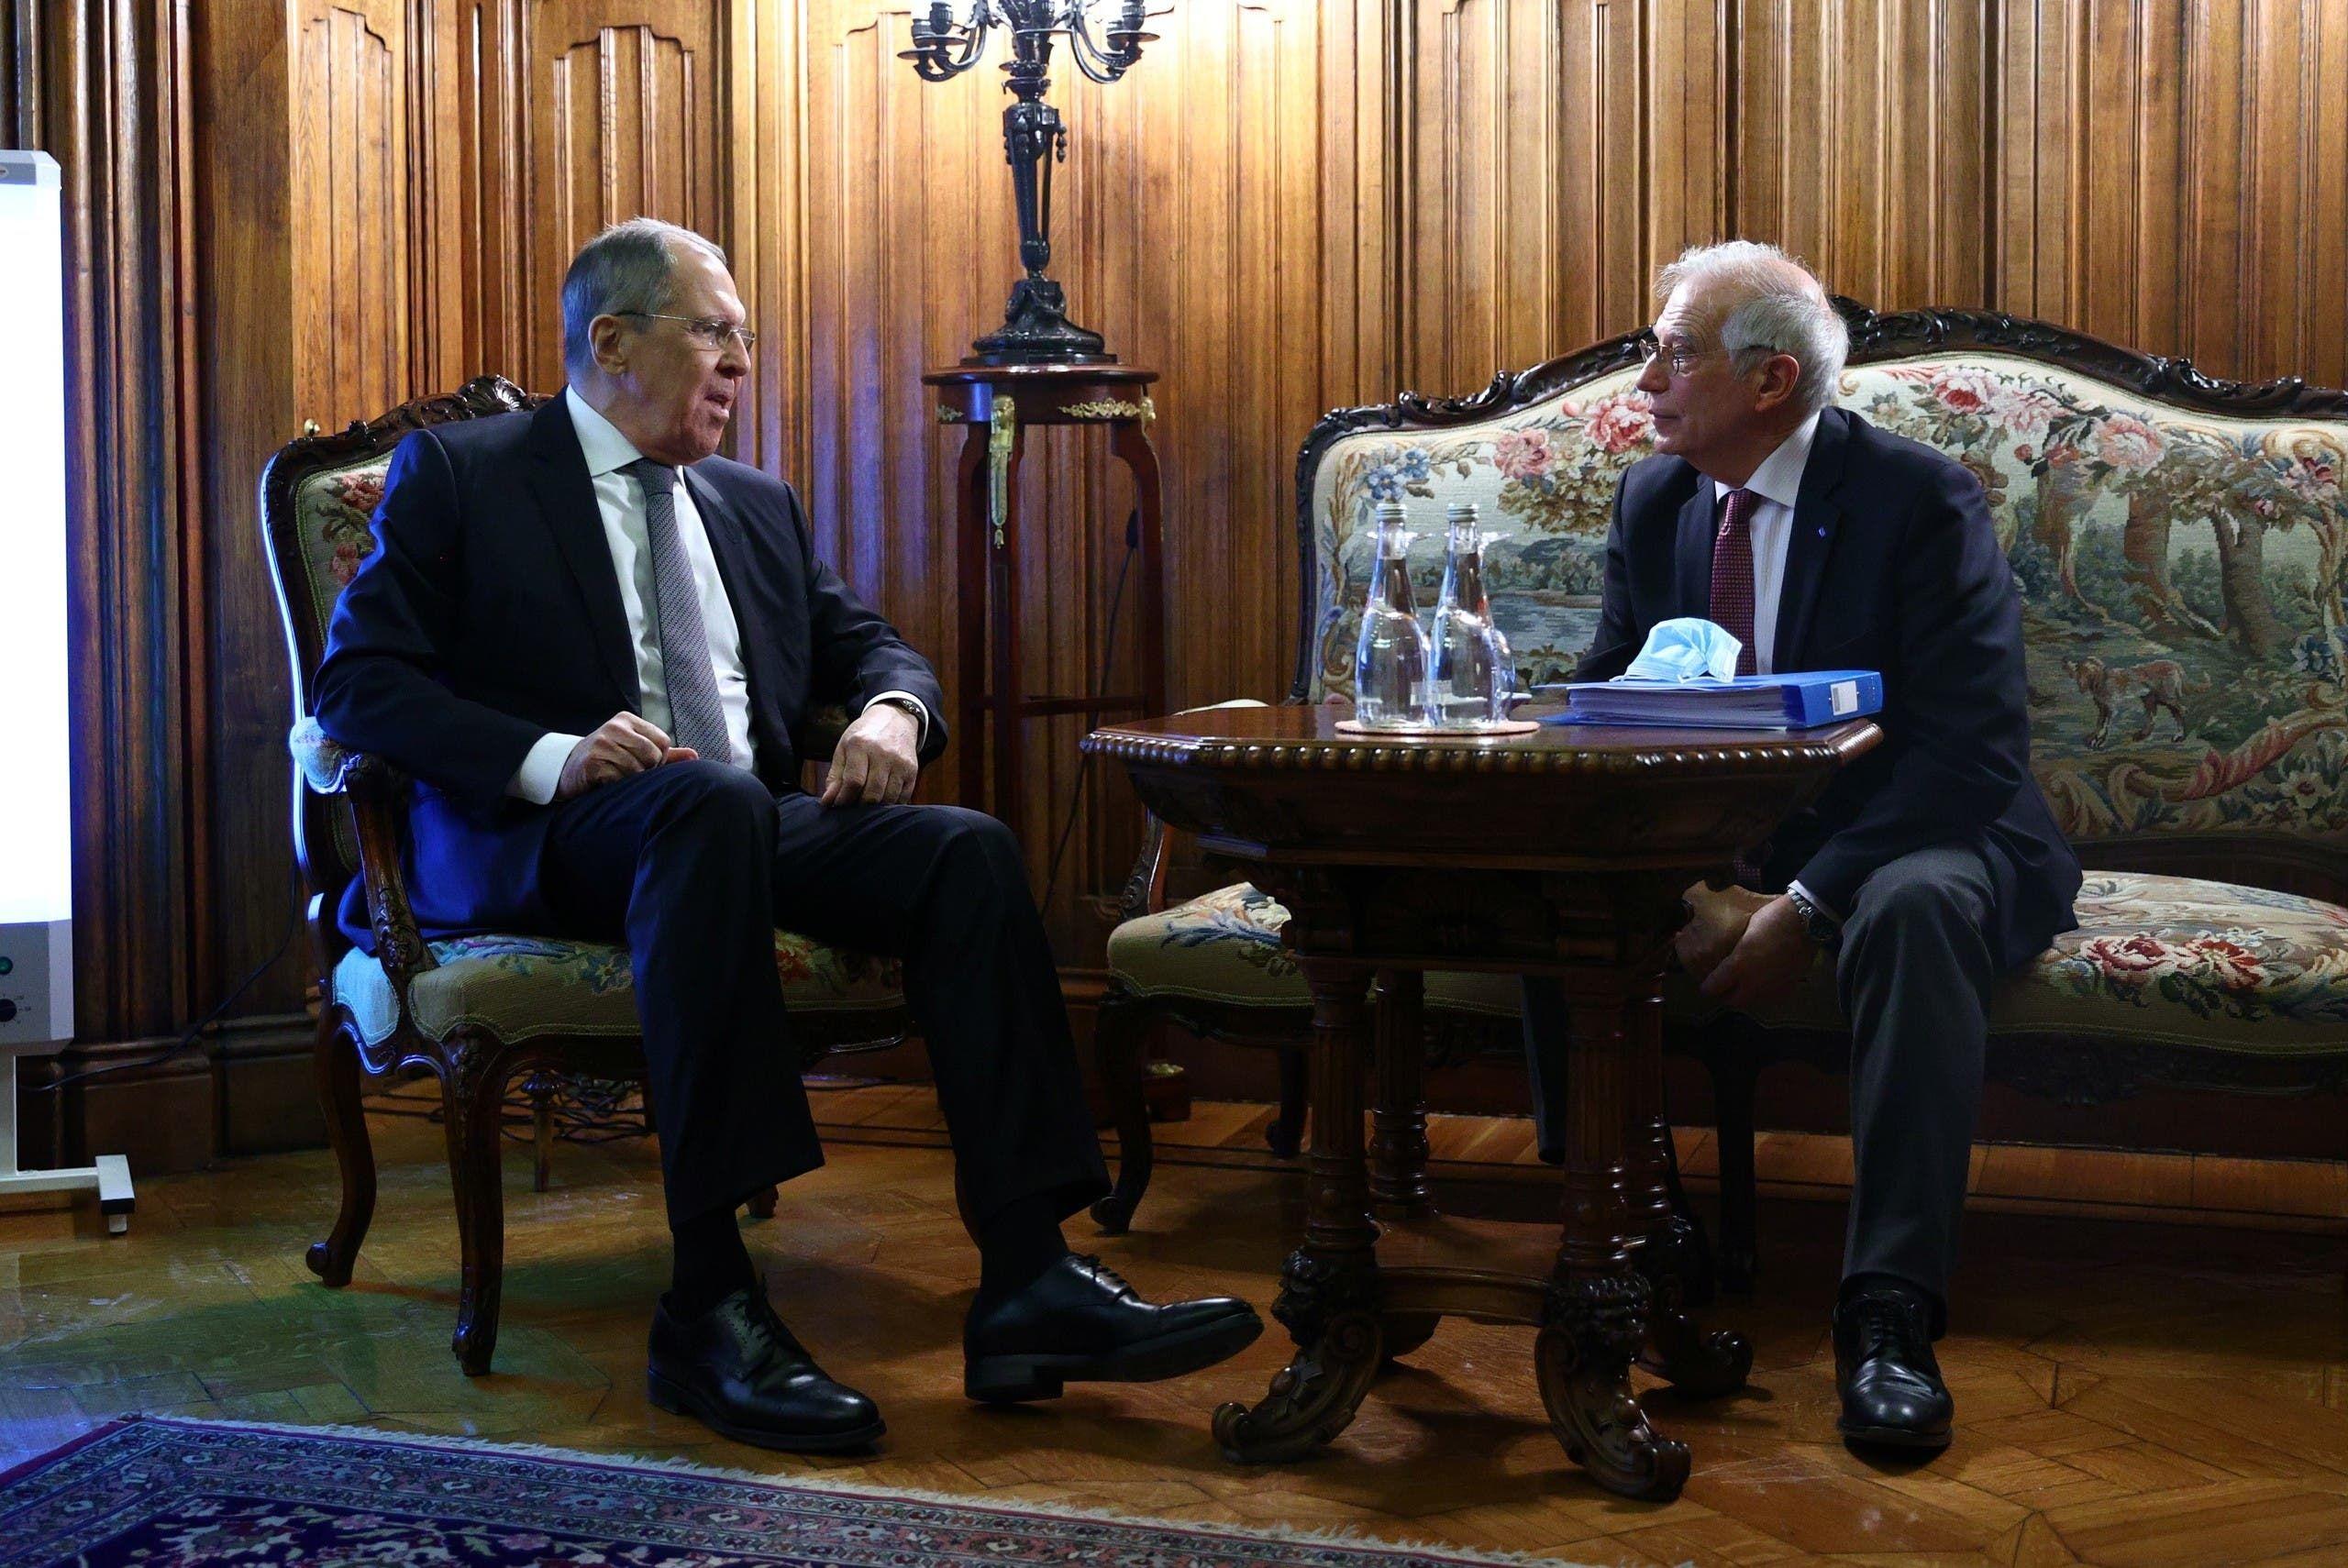 من اجتماع بوريل بلافروف في موسكو